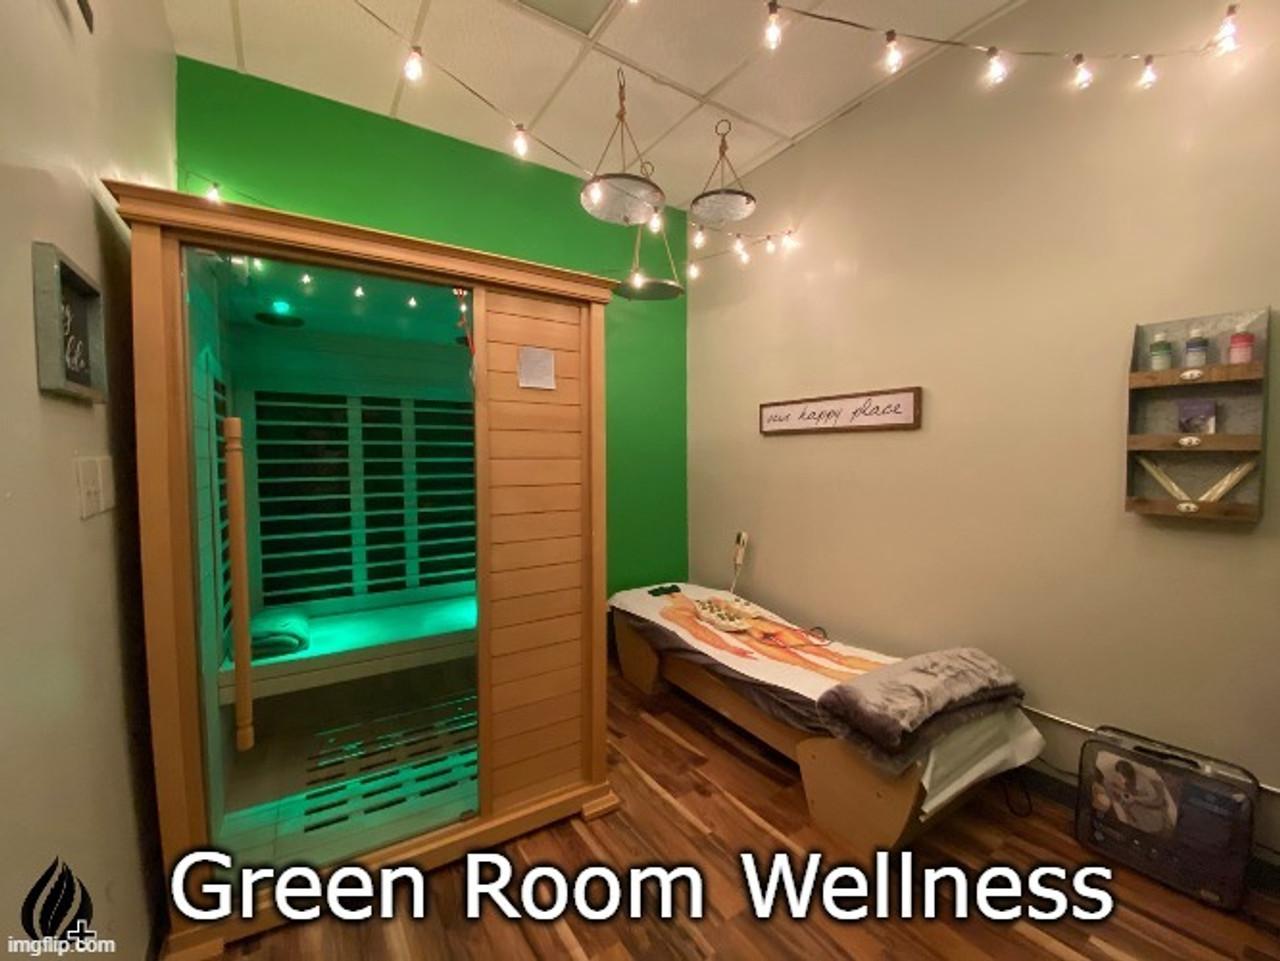 Green Room Wellness